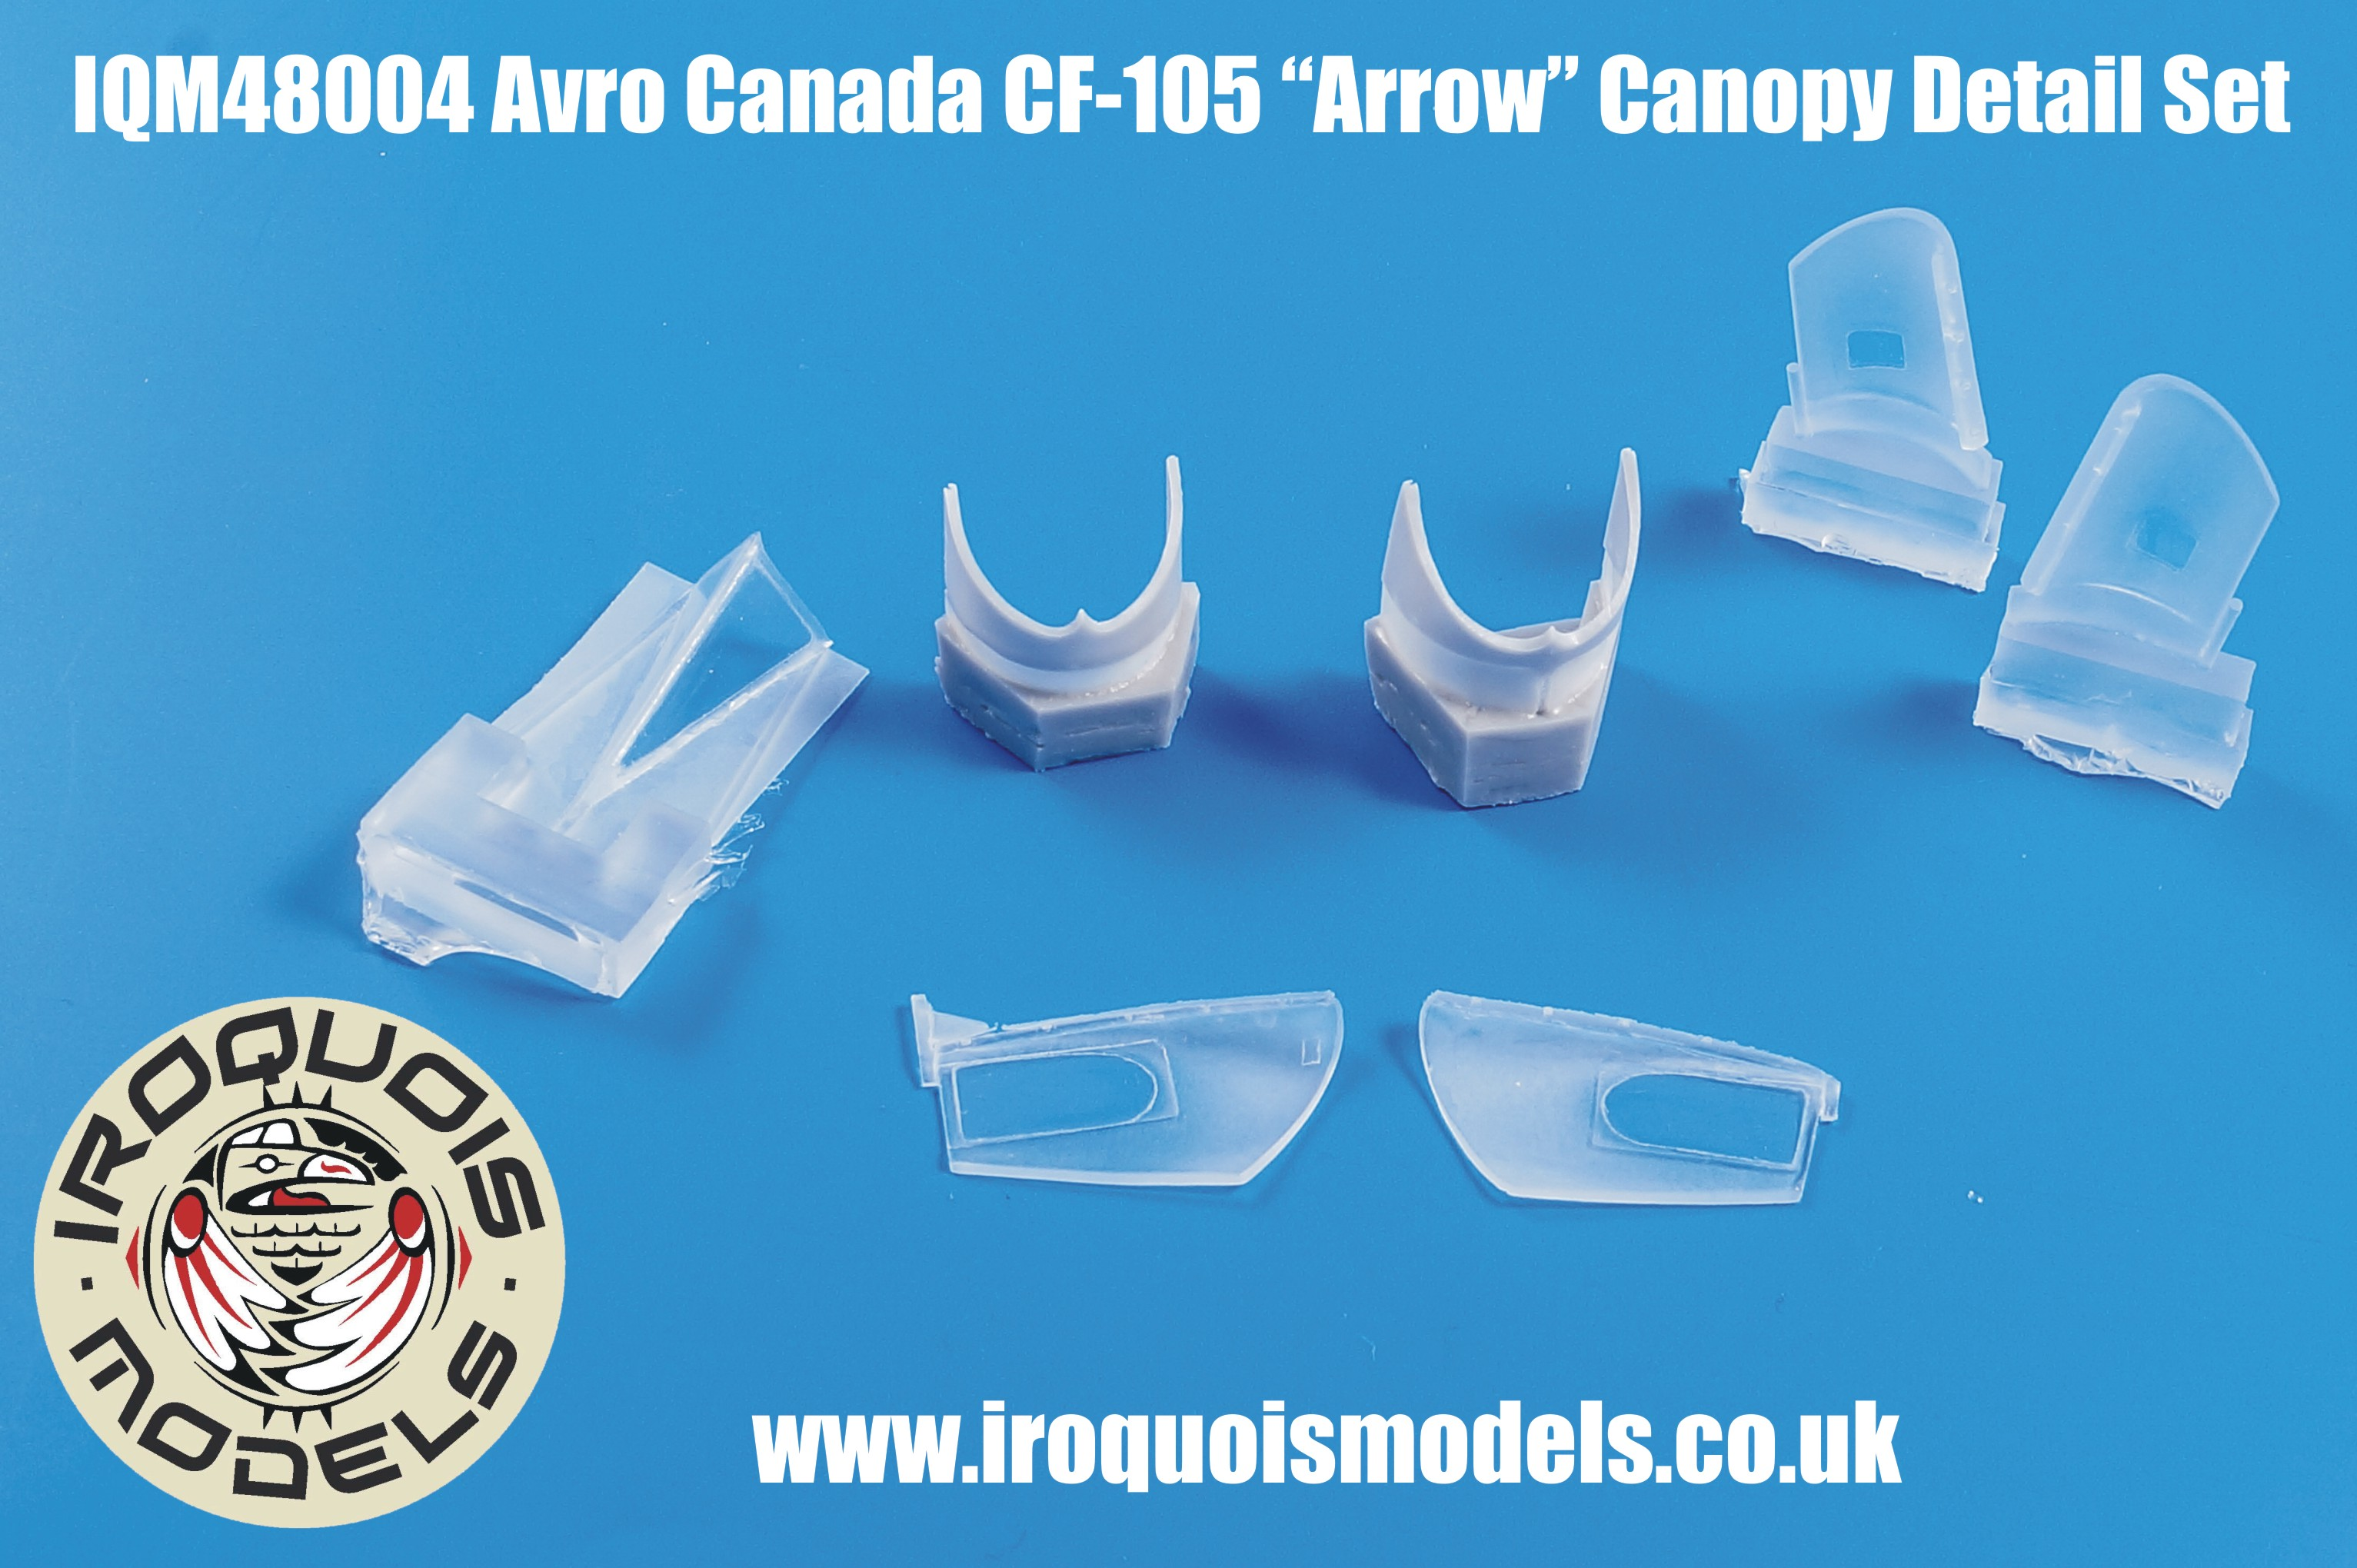 IQM48004 Avro-Canada CF-105 Avro Arrow open canopy set